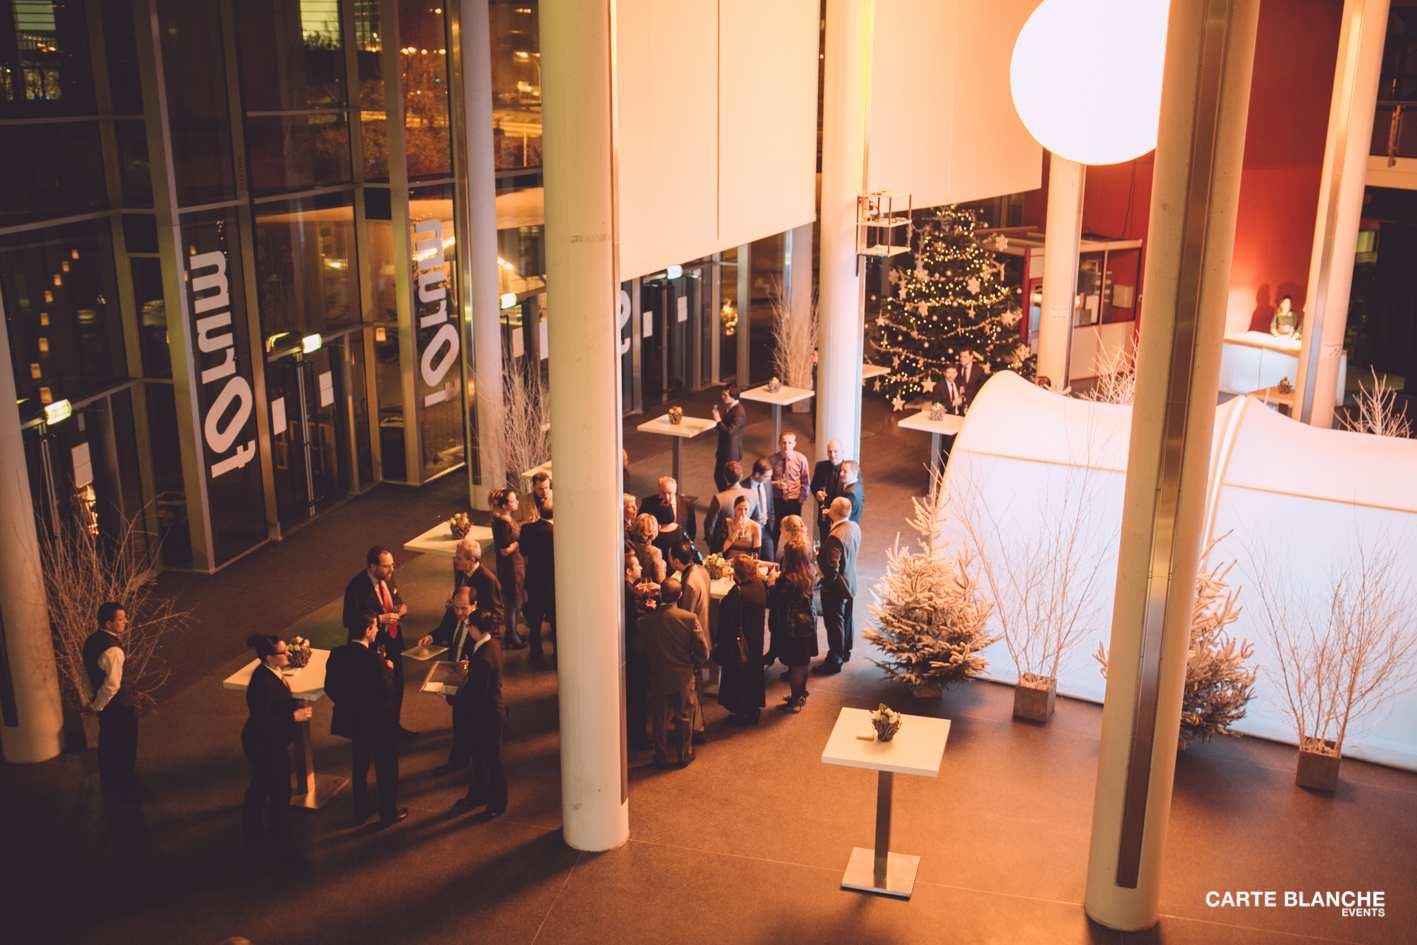 xmas-party-ferrero-2013-partage-rencontre-projet-lux